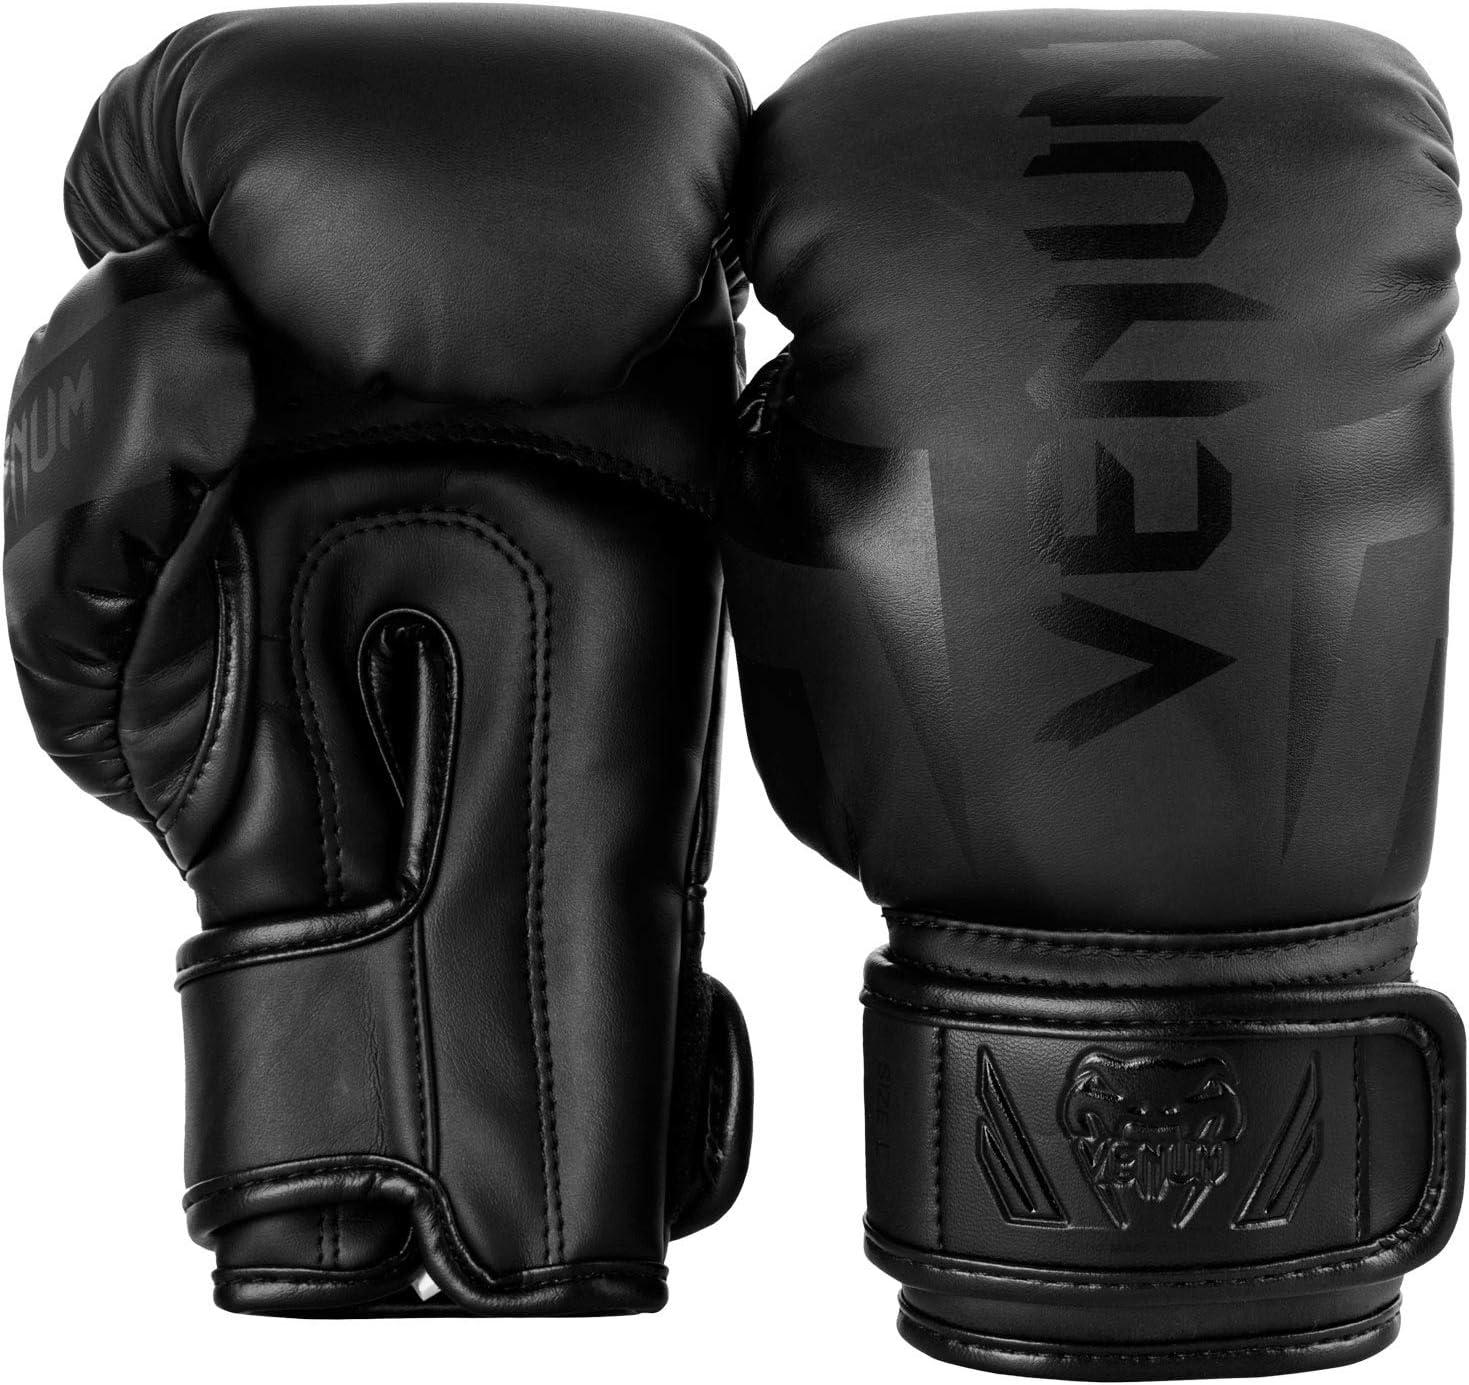 Guantes de Boxeo para ni/ño VENUM Elite